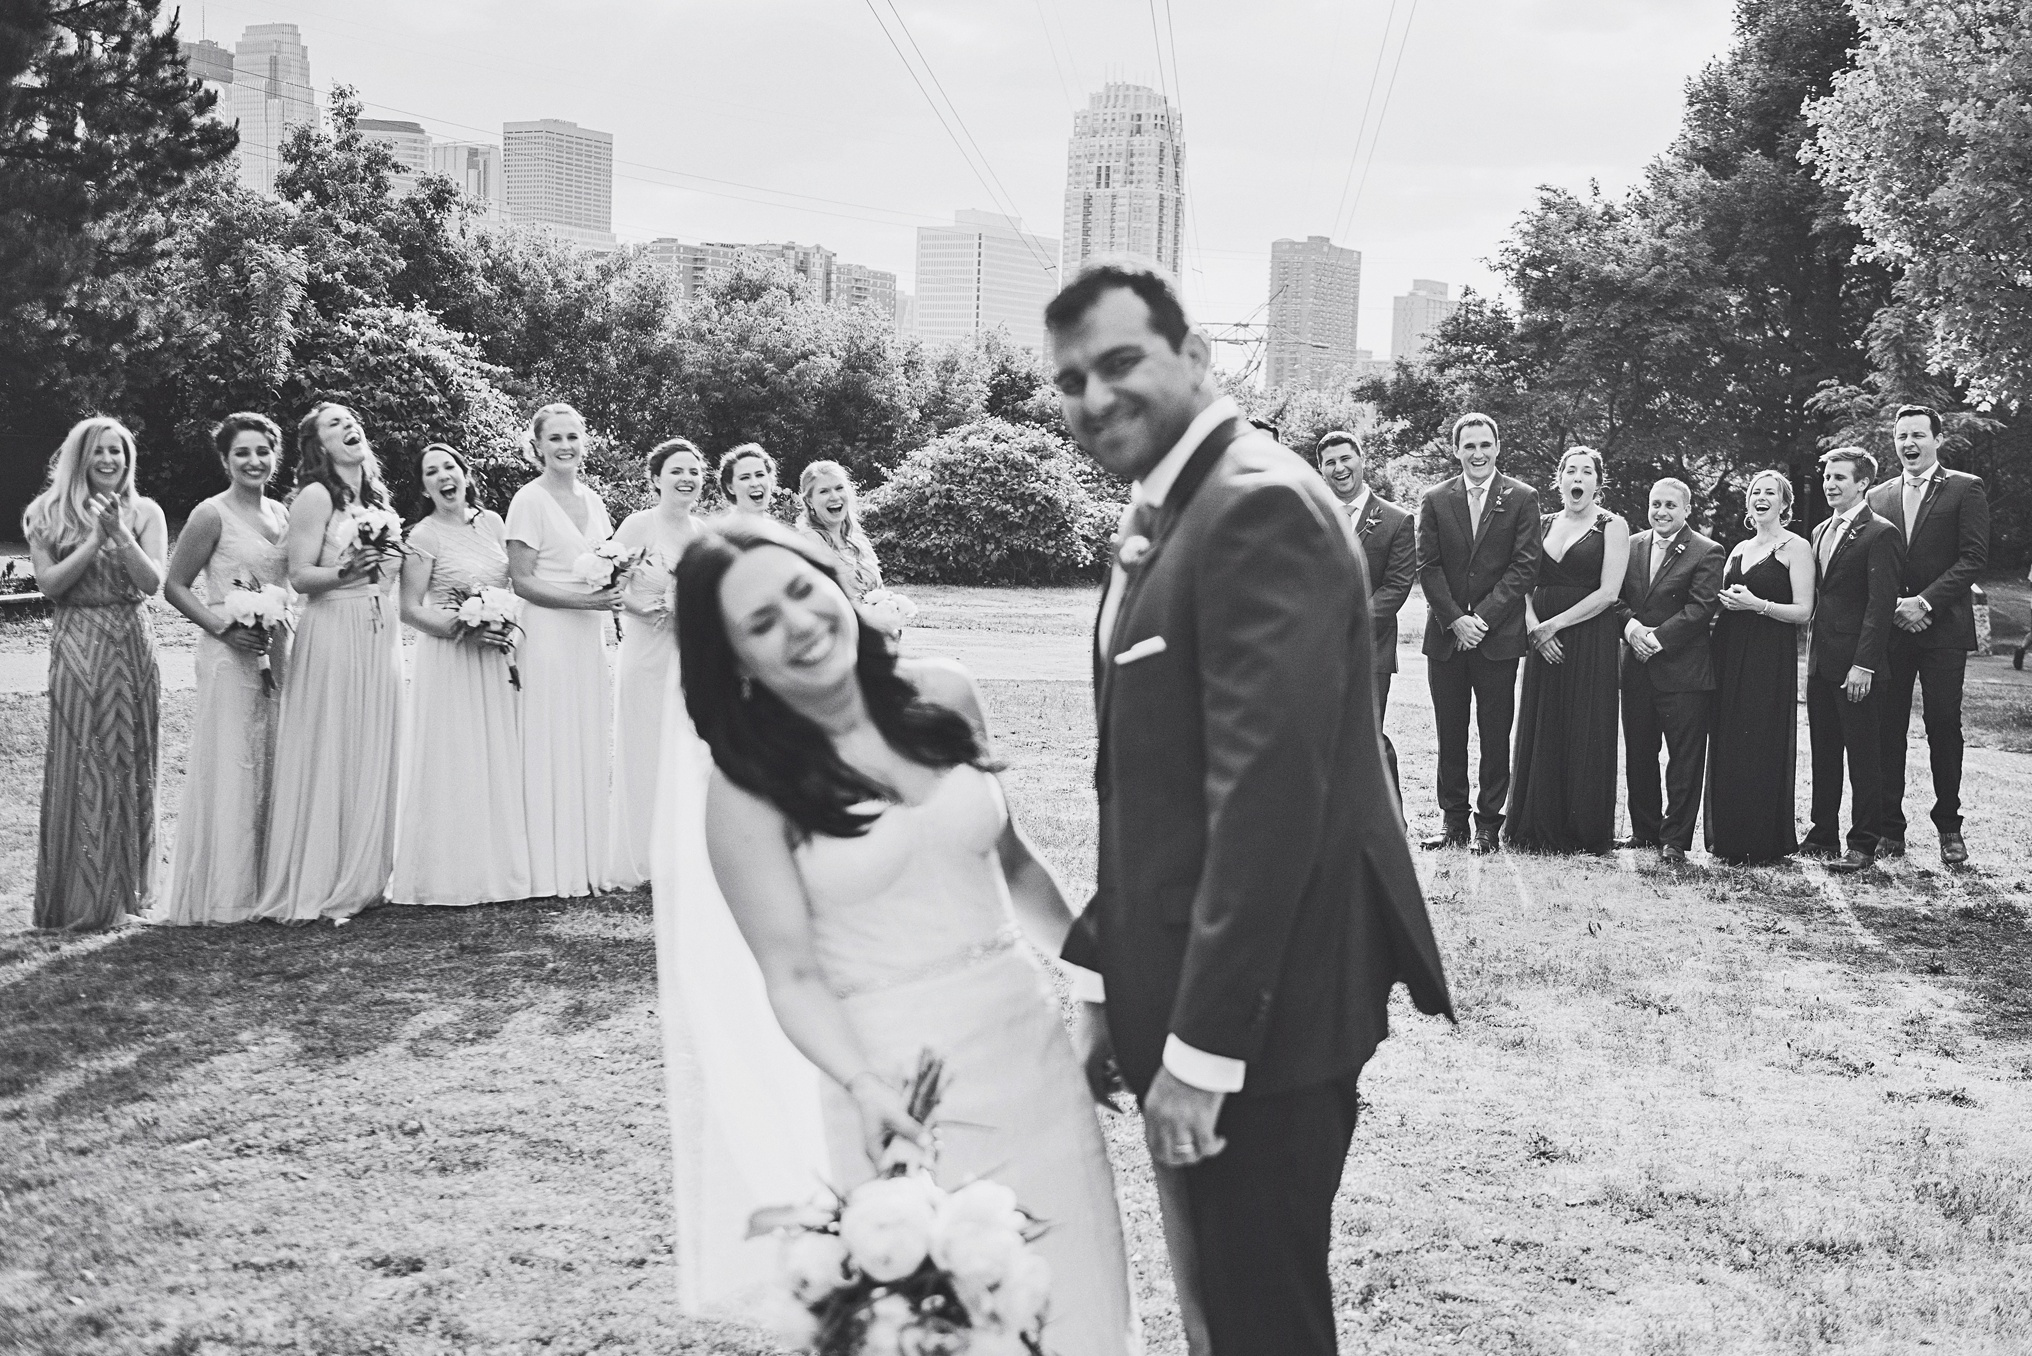 best_wedding_photography_2017_by_lucas_botz_photography_057.jpg